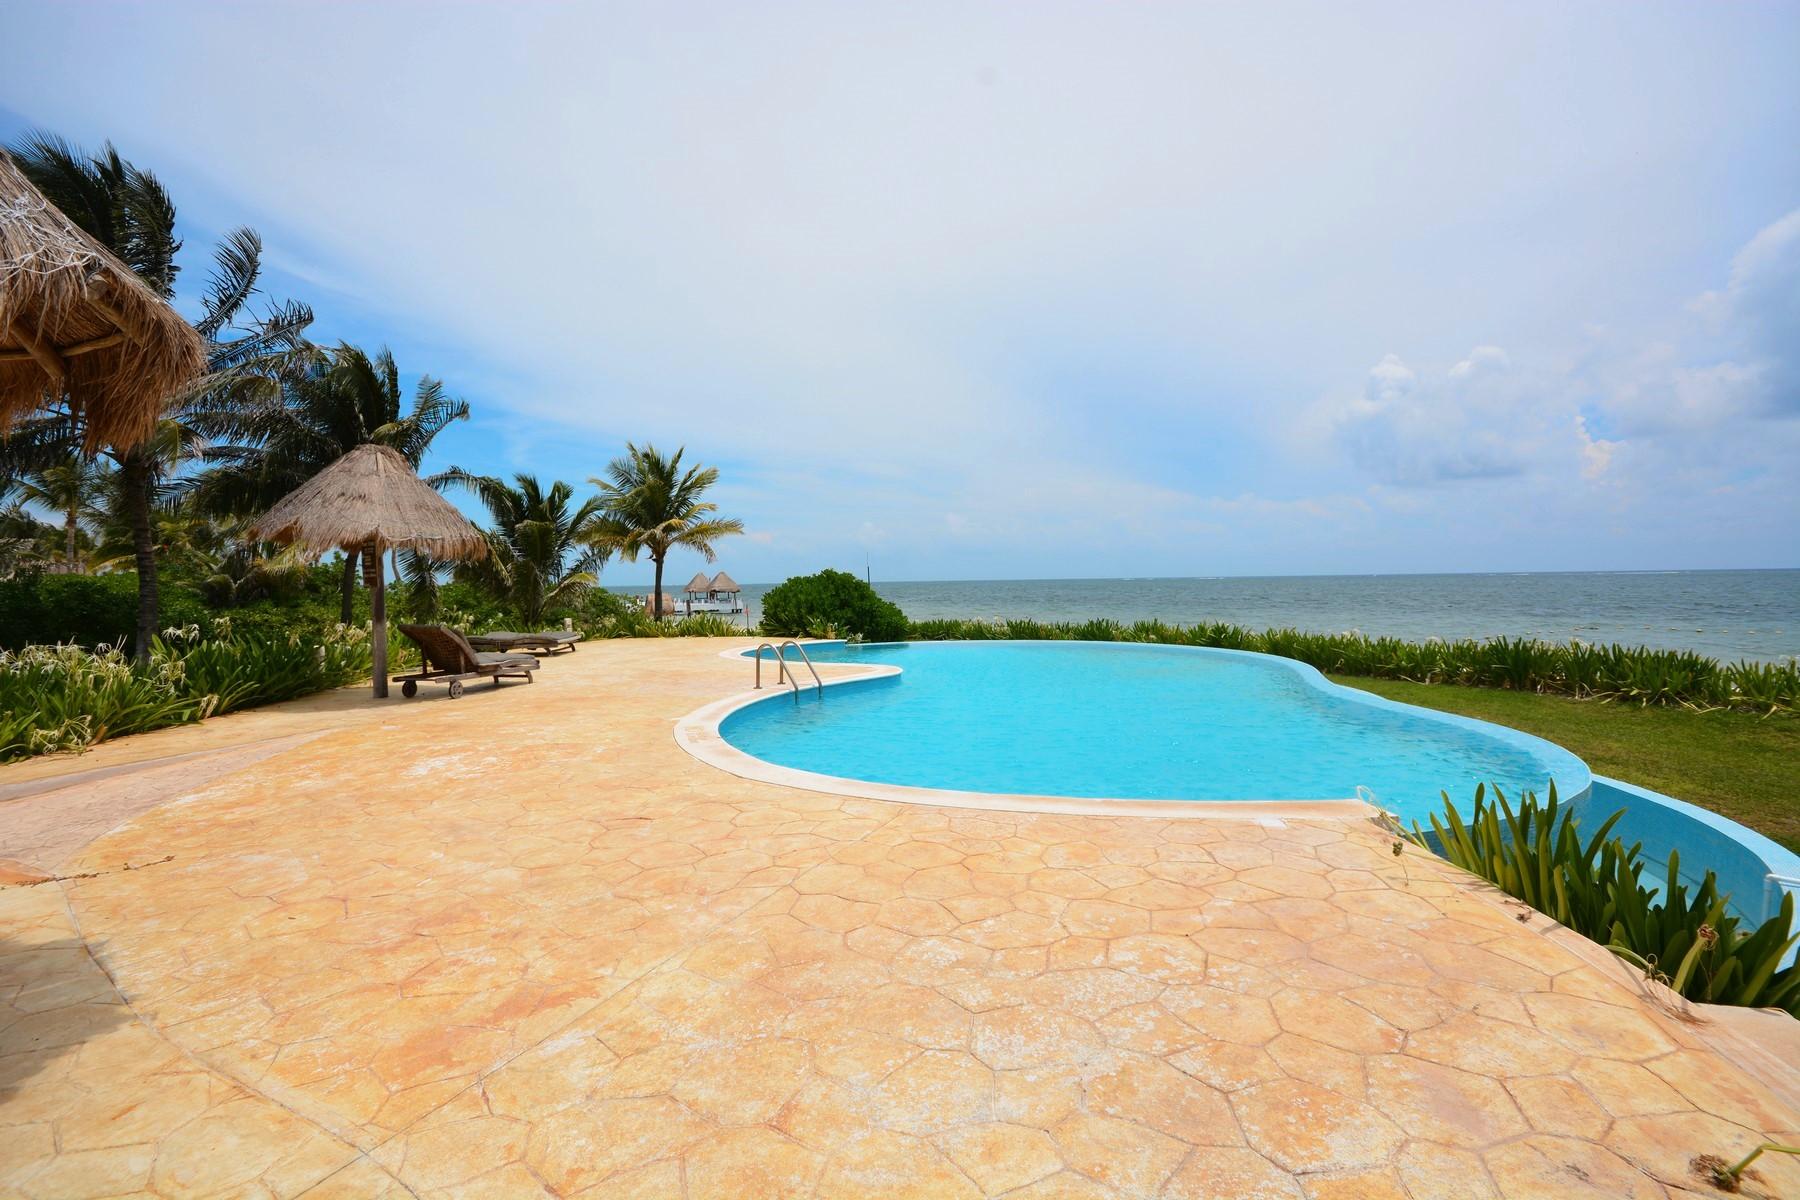 Single Family Home for Sale at SOL VILLAGE Villa Del Sol SM-11 MZ-05 L-1 Puerto Morelos, Quintana Roo 77580 Mexico